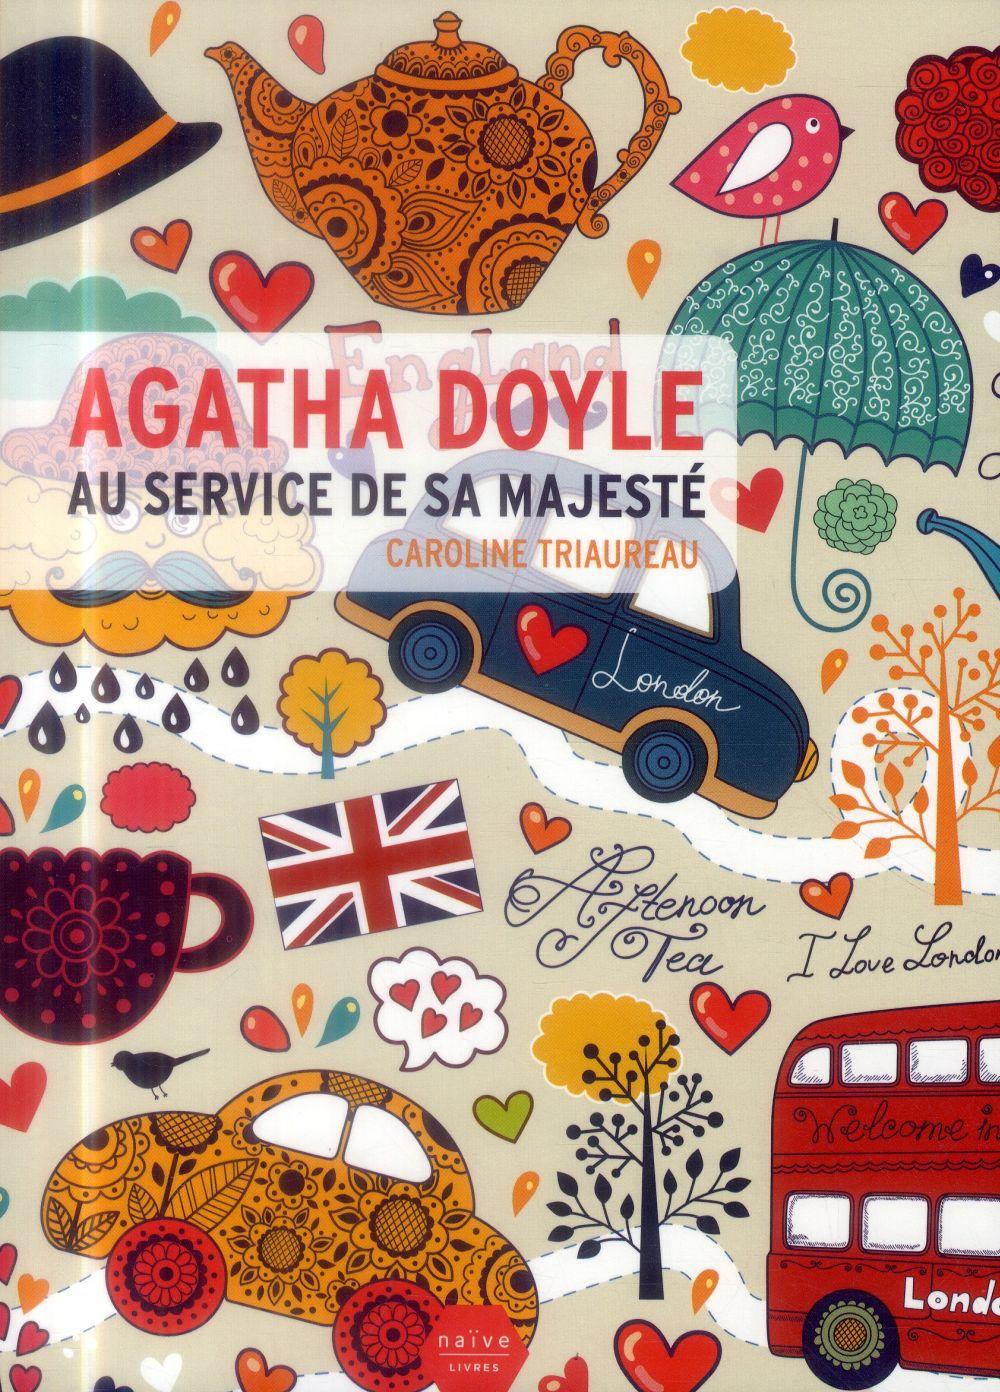 Agatha Doyle ; au service de sa majesté